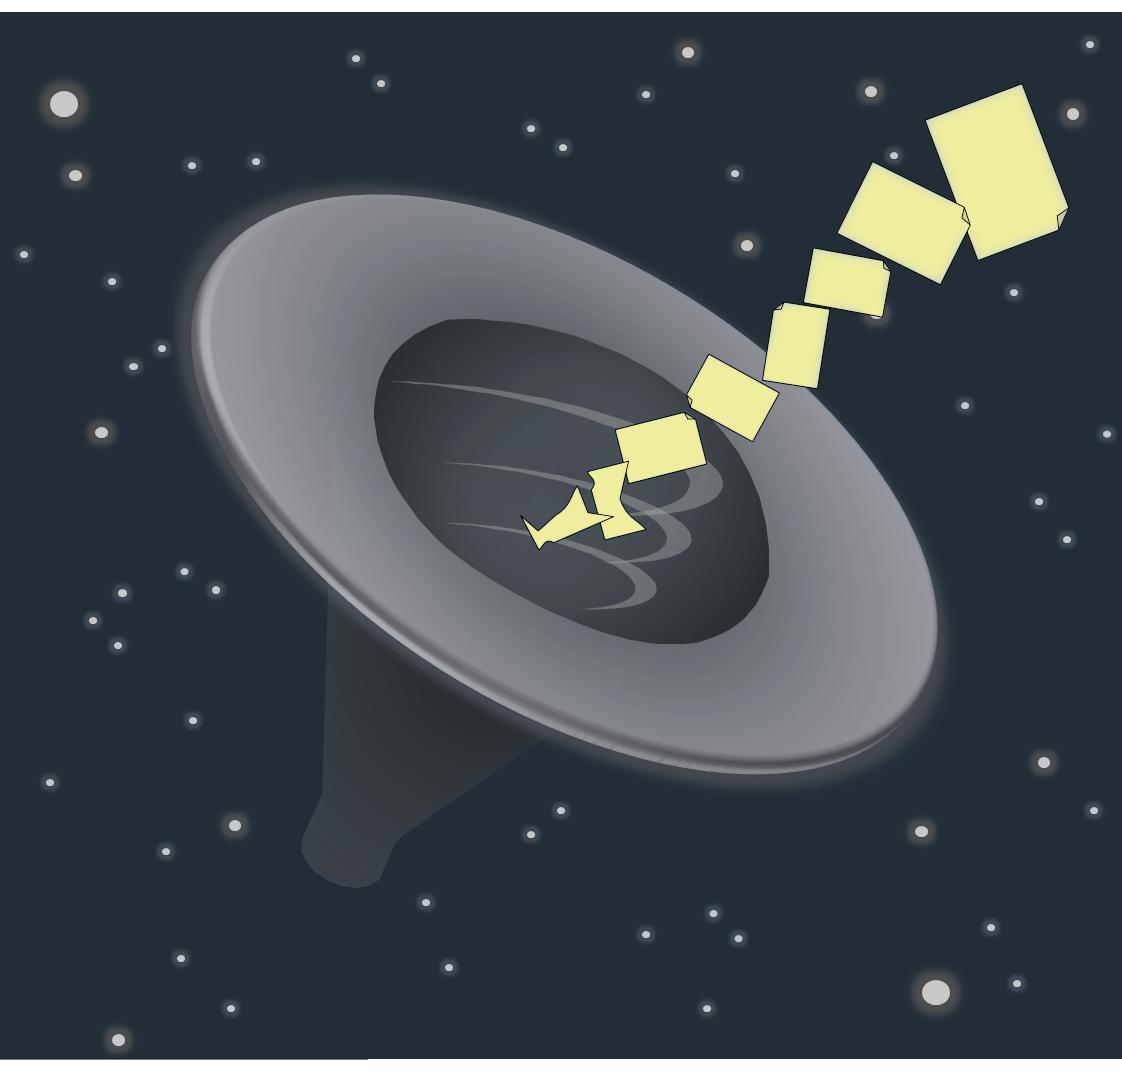 Project Black Hole V2